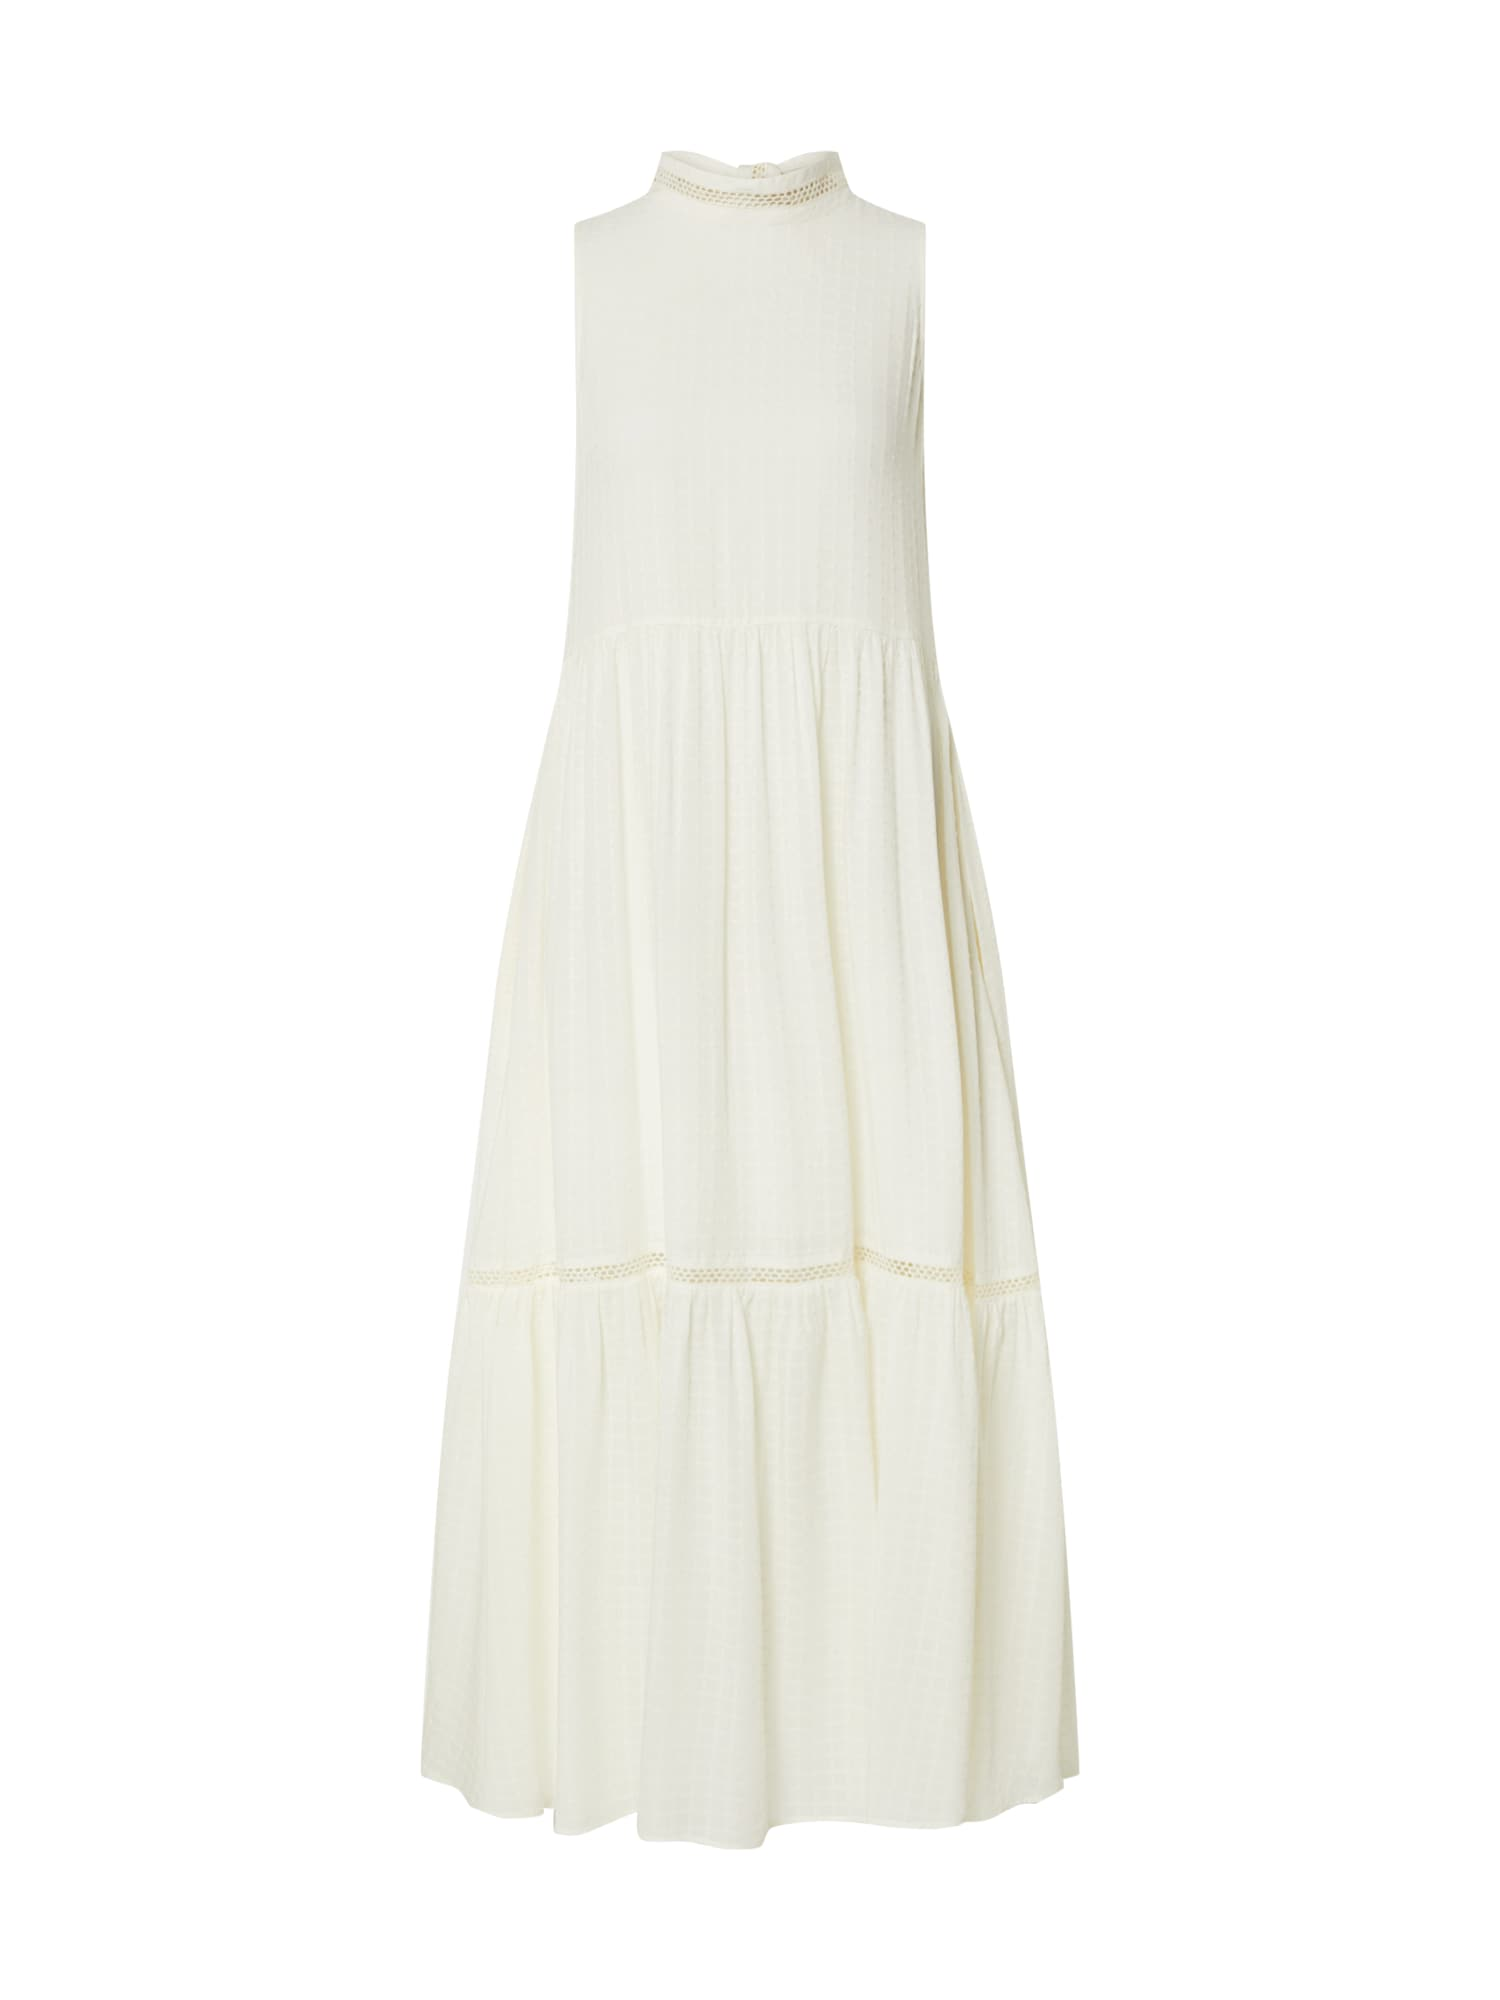 BOSS Suknelė balta